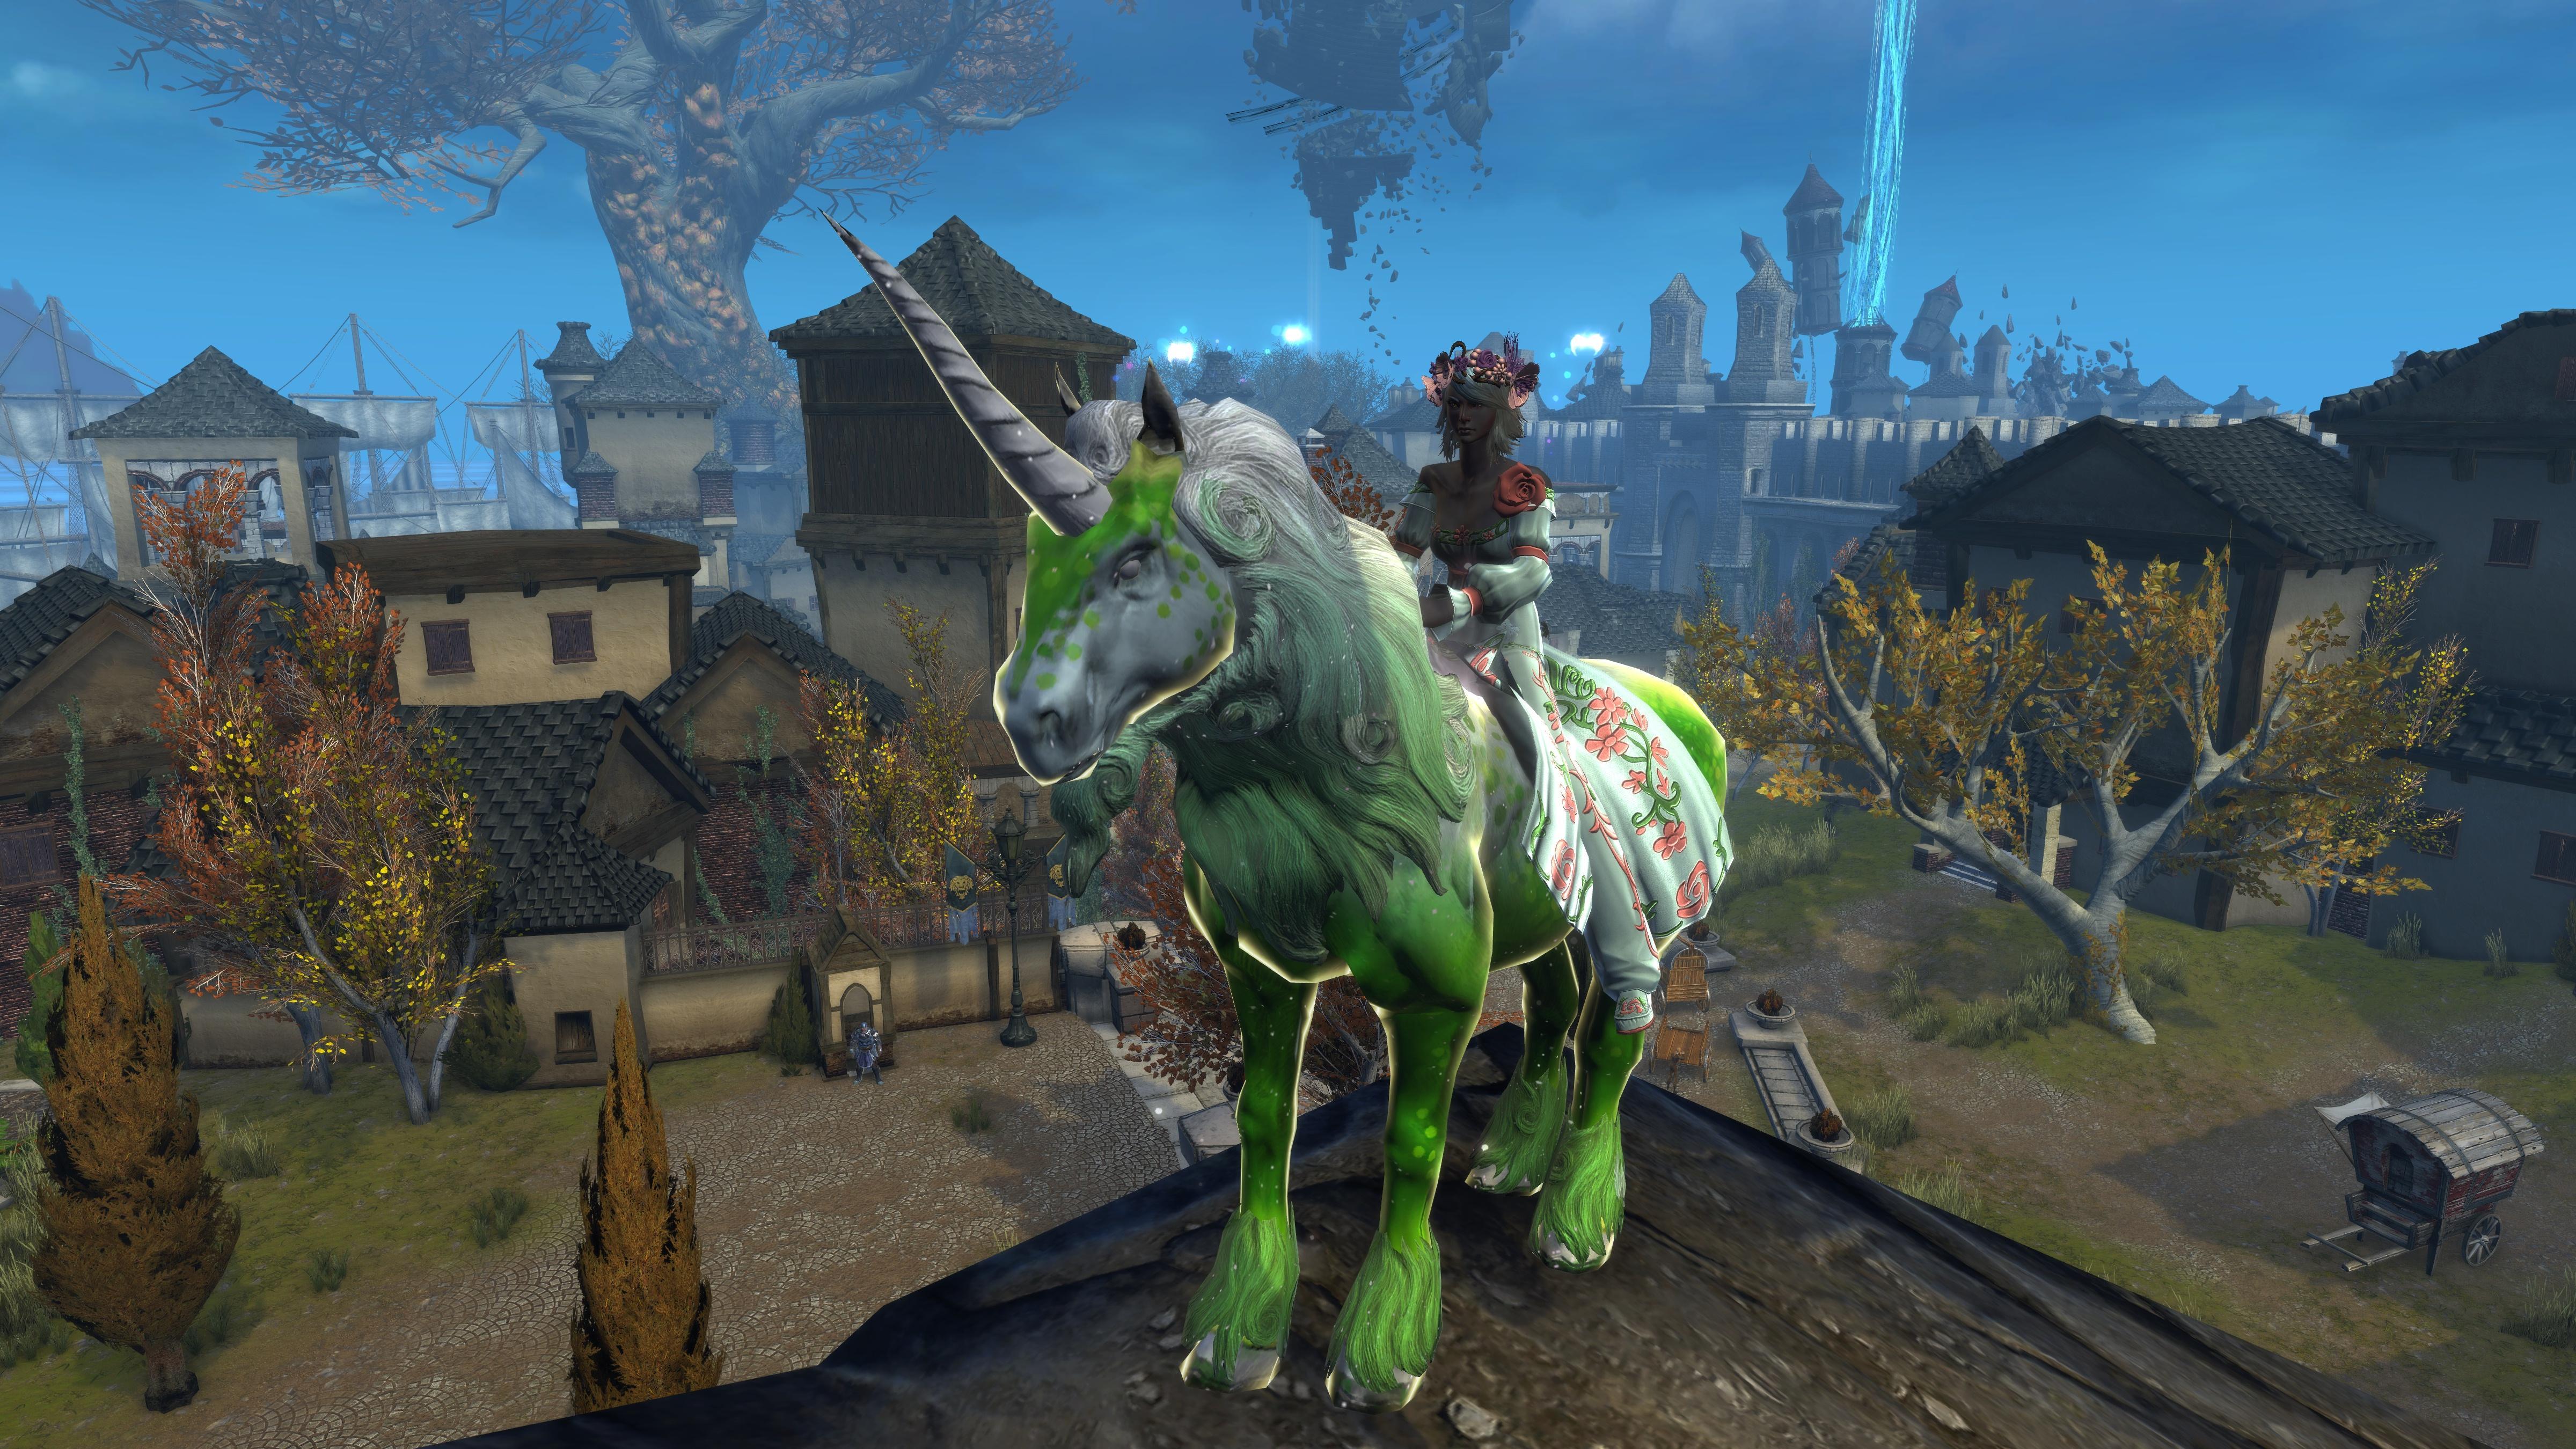 Chartreuse (Xbox) Unicorn